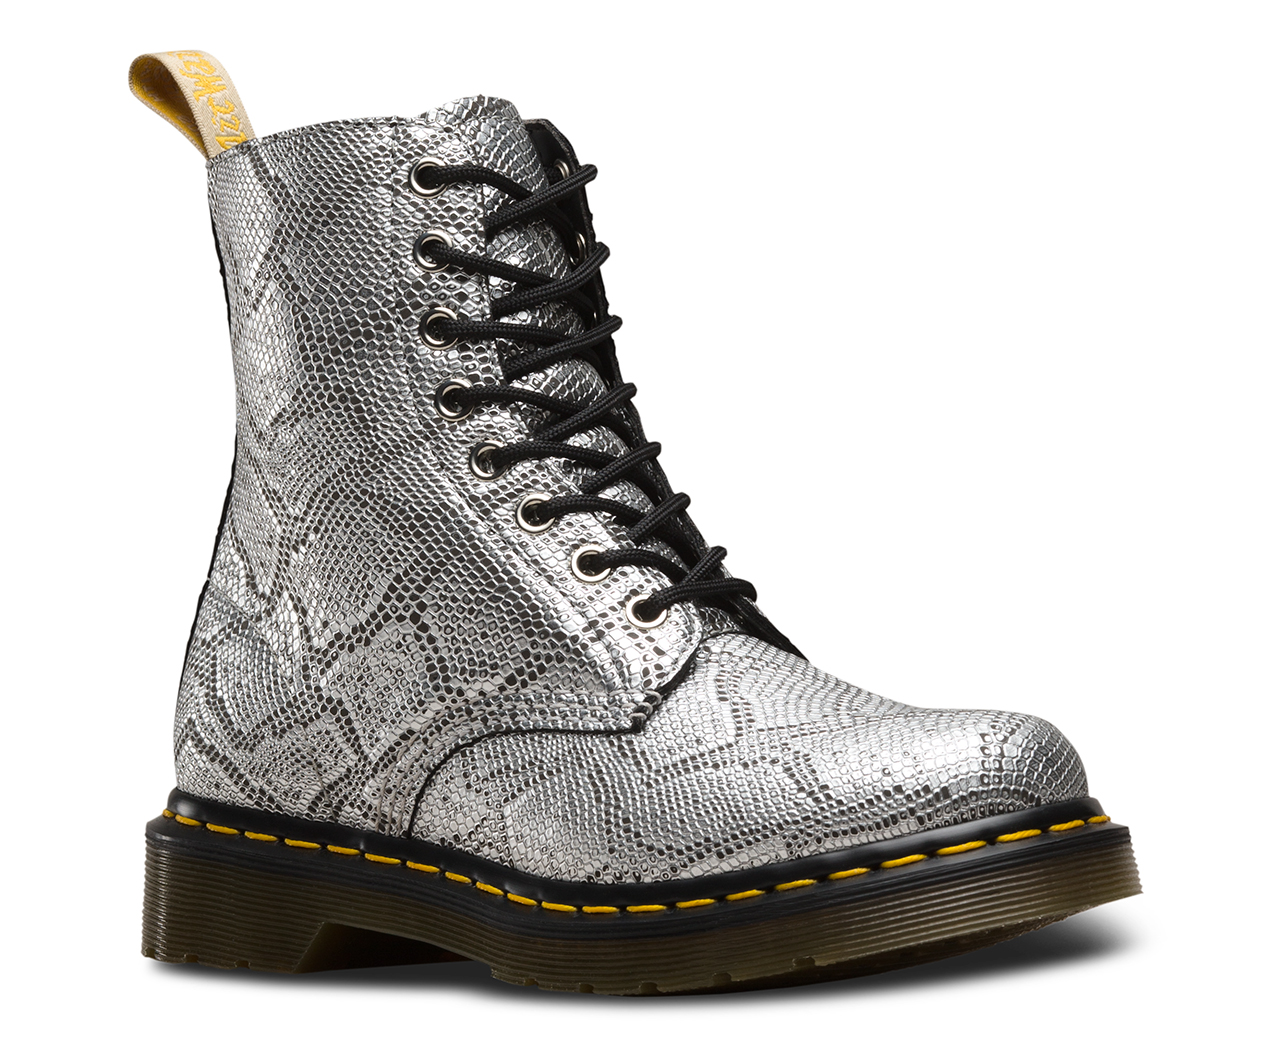 Dr Martens Women's Vegan 1460 Pascal Lace Up Boot Metallic Snake Silver US8/EU39/UK6/CN39 W0wCRI5